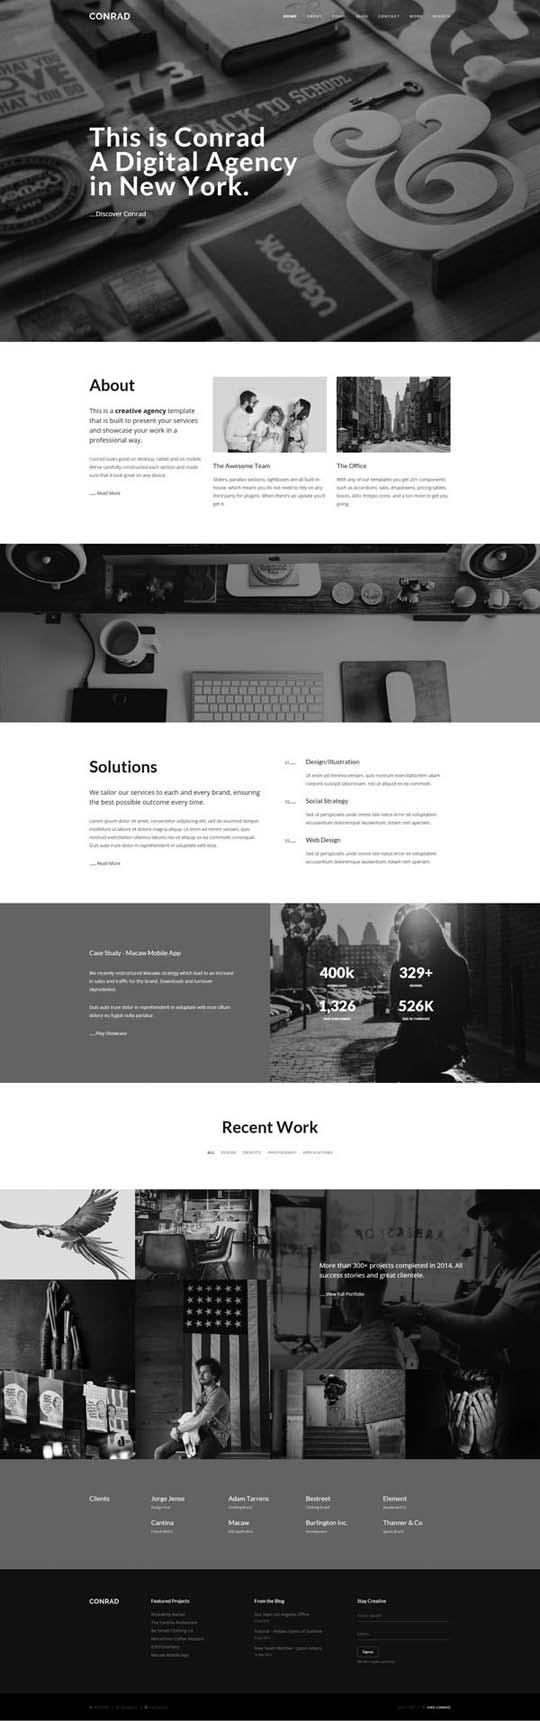 3.Responsive Design HTML5 Website Templates